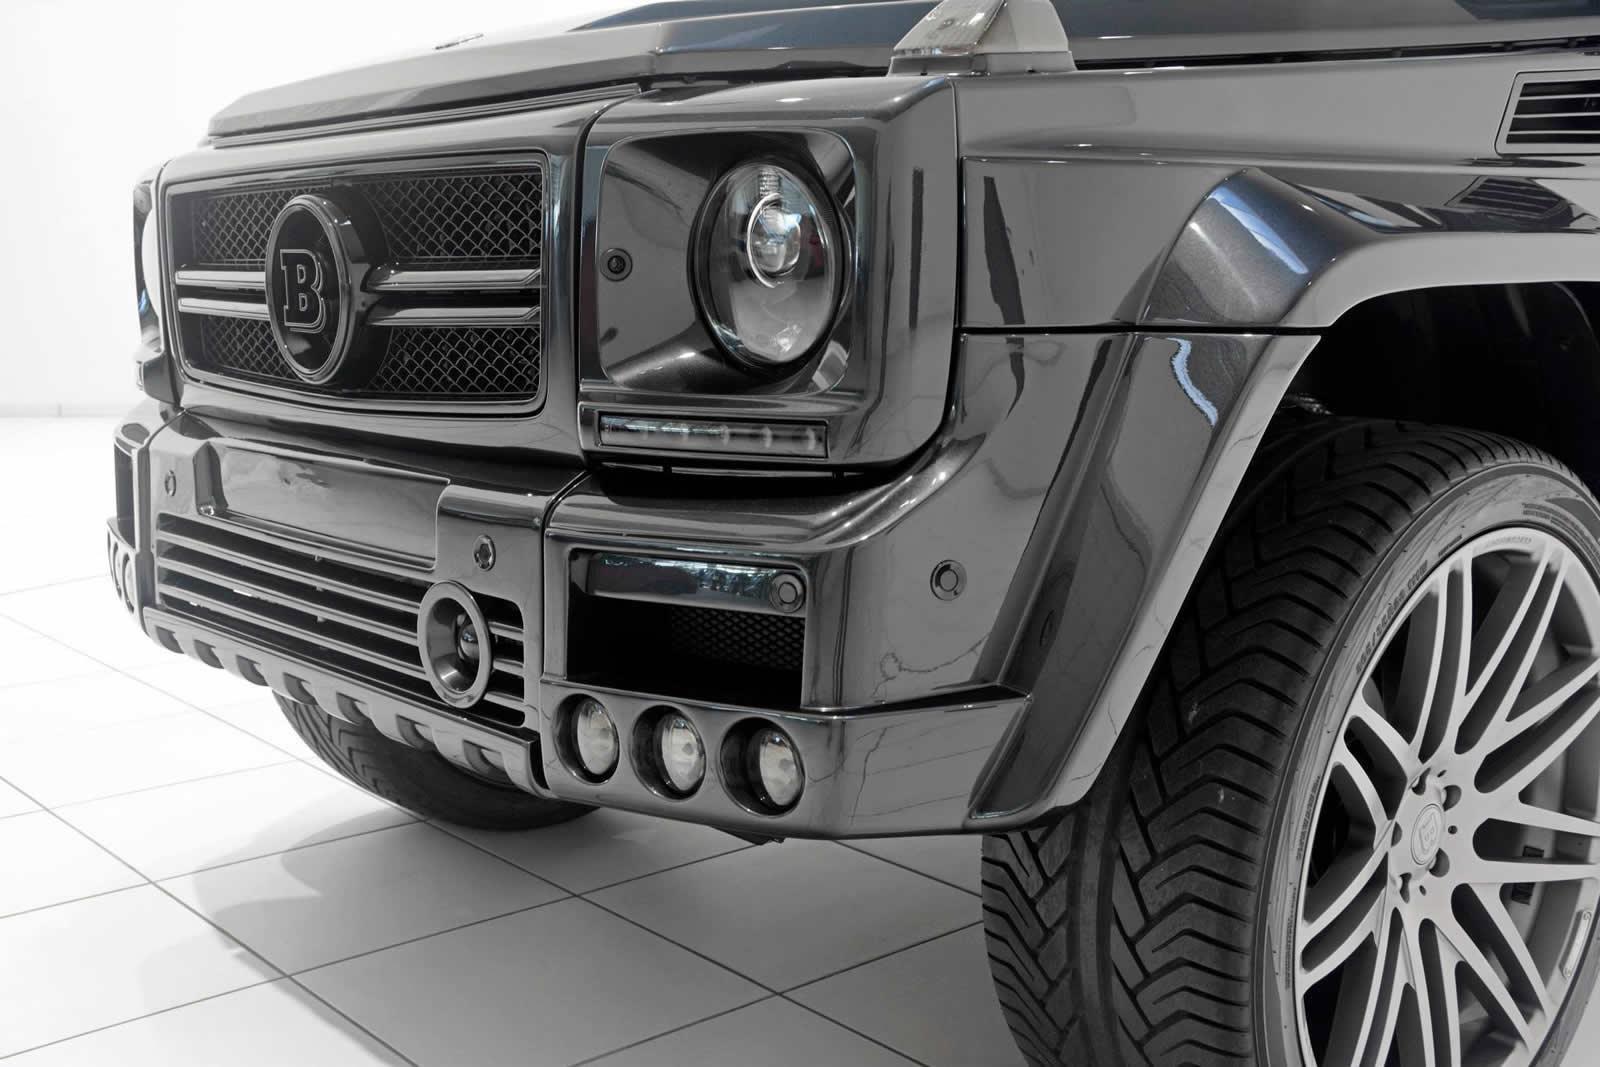 Brabus Mercedes Benz G500 Convertible